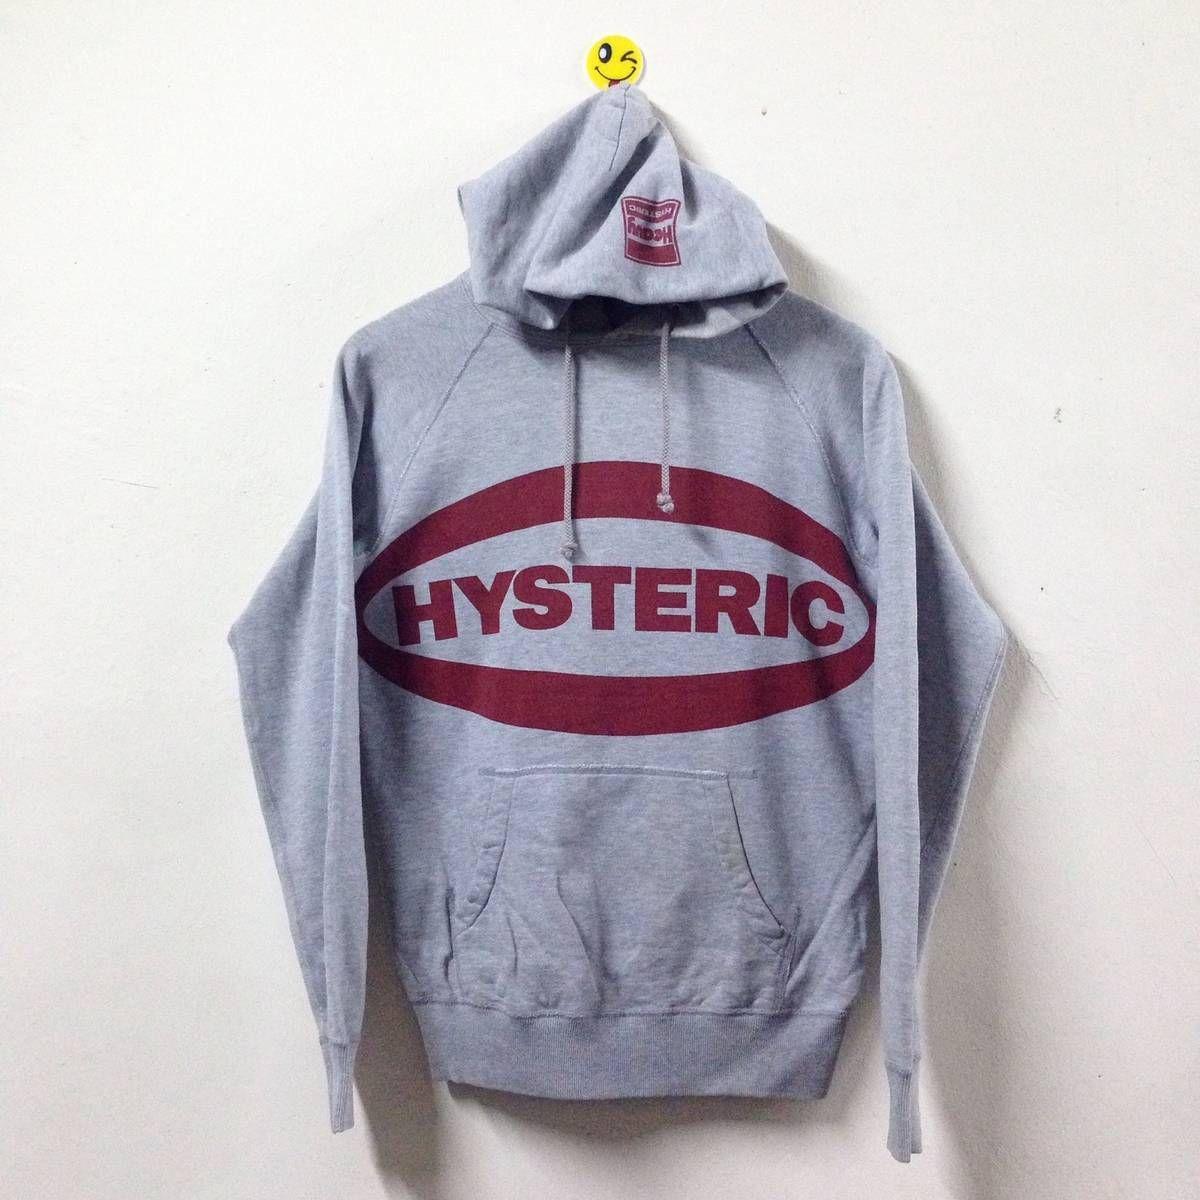 Vintage Hysteric Glamour Yohji Takuya Takahashi Crewneck Sweater tPwtQKu